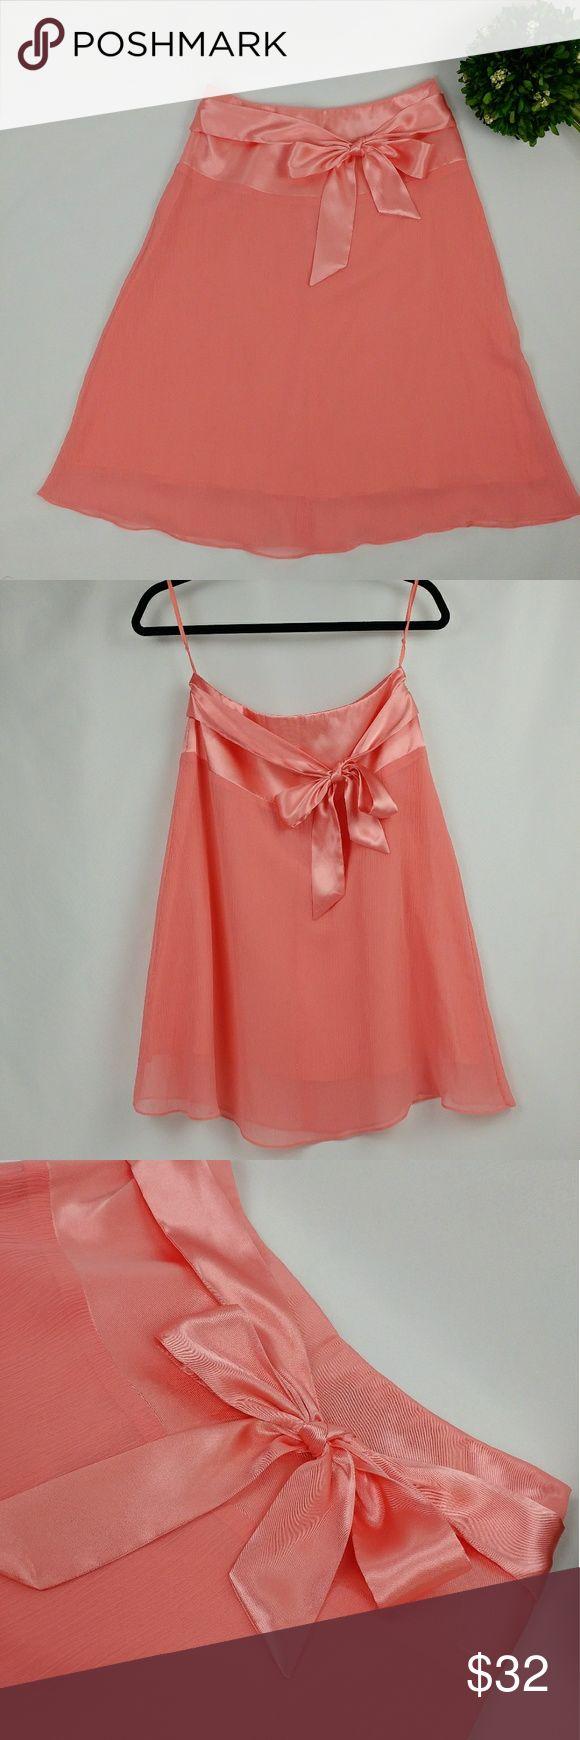 Selling this Victorias Secret silk and chiffon coral midi skirt on Poshmark! My username is: glamourrack. #shopmycloset #poshmark #fashion #shopping #style #forsale #Victoria's Secret #Dresses & Skirts